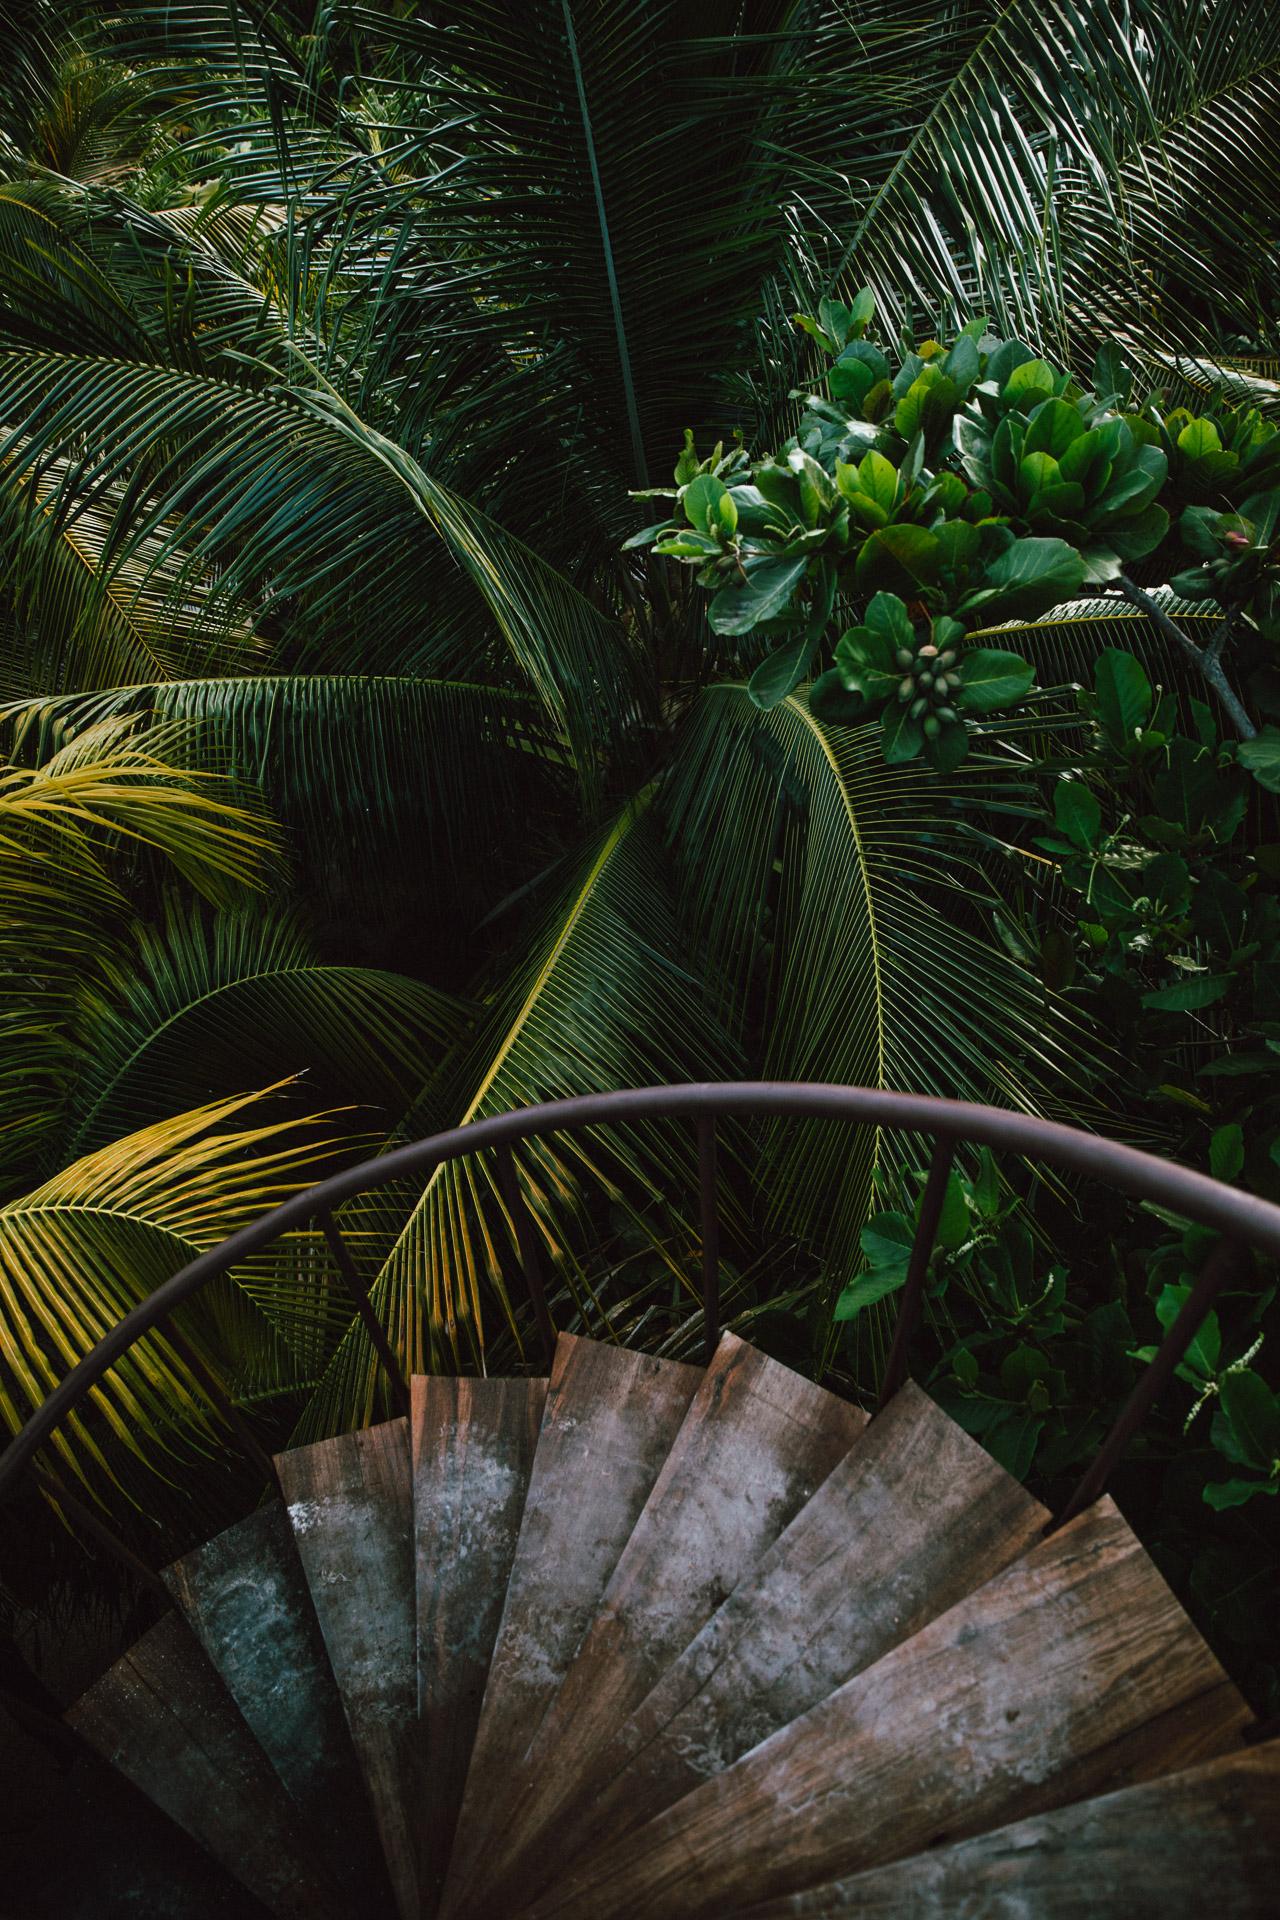 caribbean-hotel-resort-photographer-olas-tulum-mexico-0354.jpg